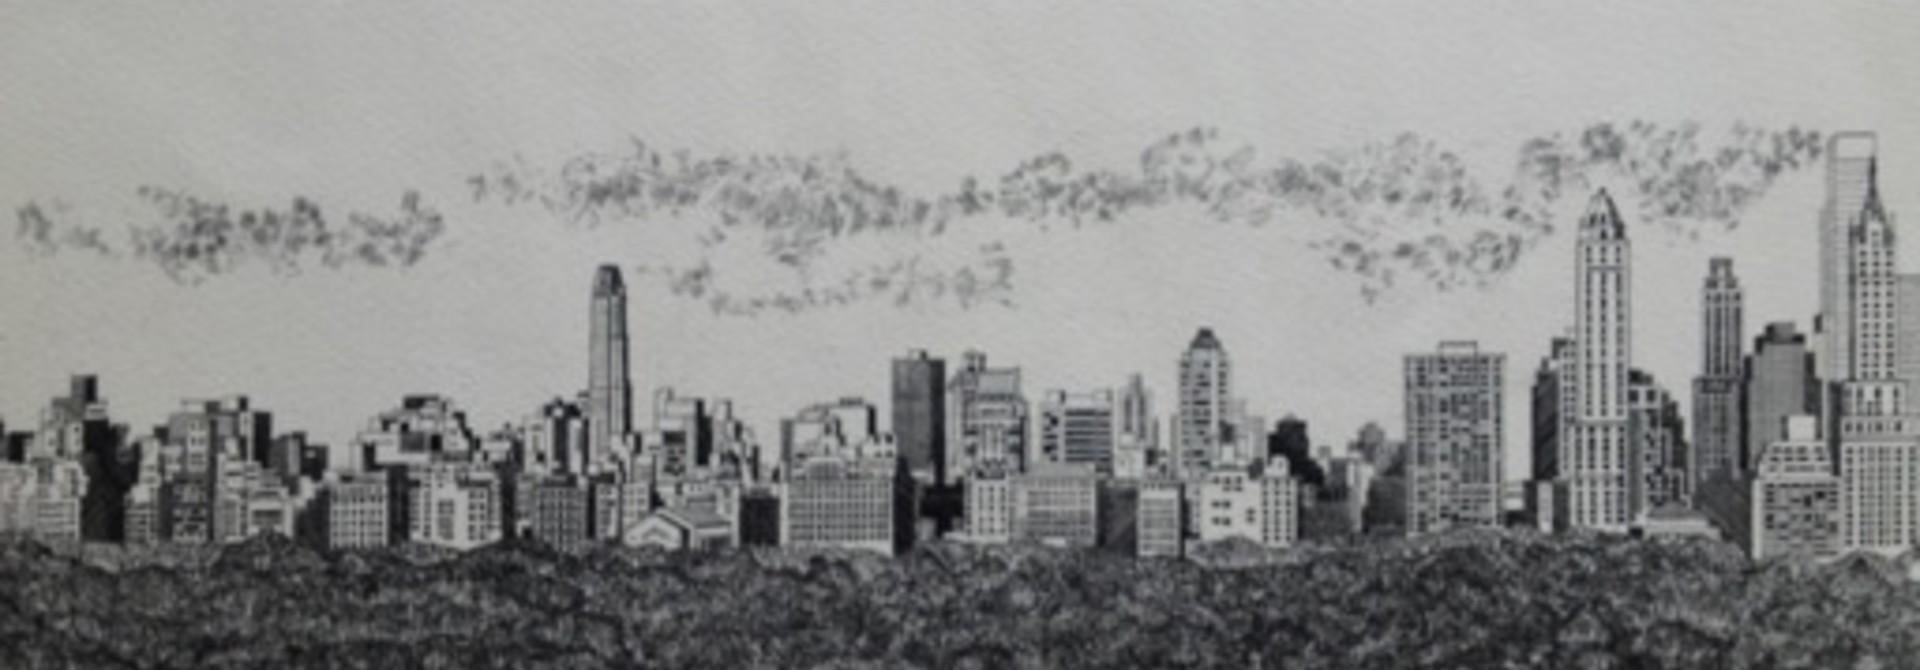 Skyline #1 Spring Parade (Cityscape)